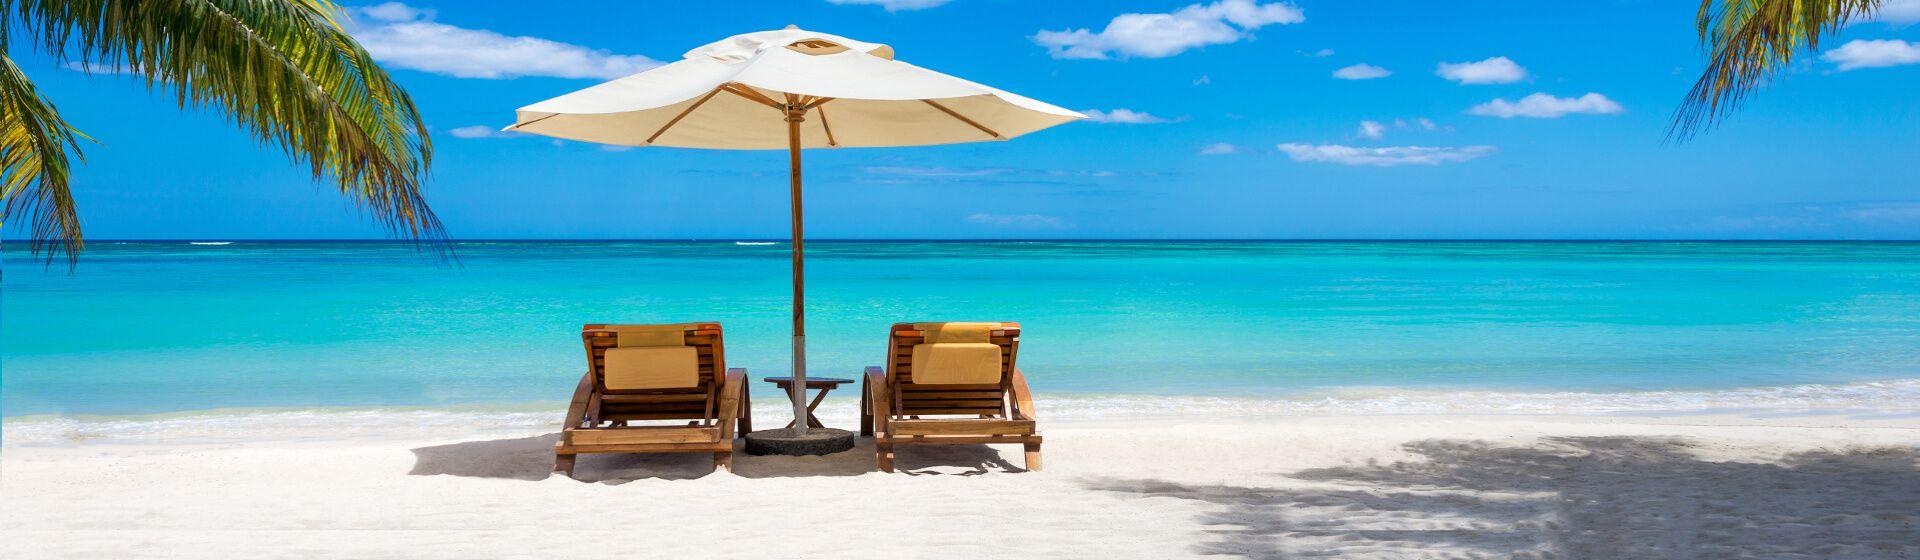 Reiseveranstalter Karibik